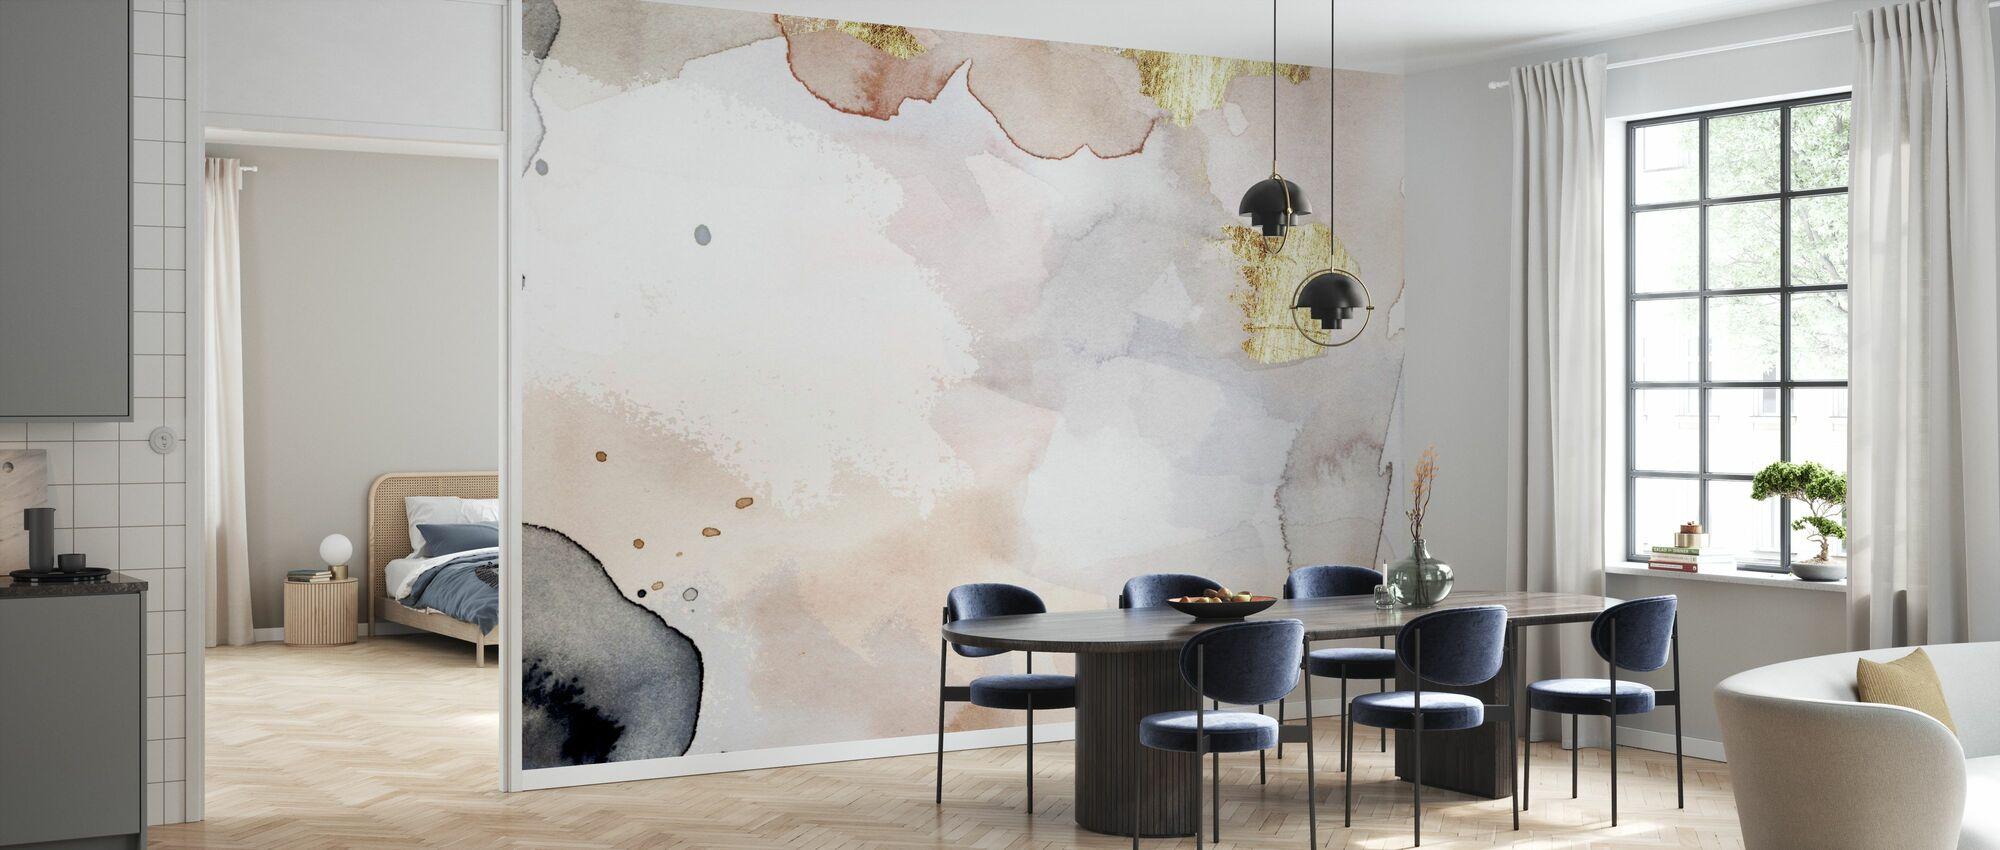 Indigo Blush and Gold - Wallpaper - Kitchen